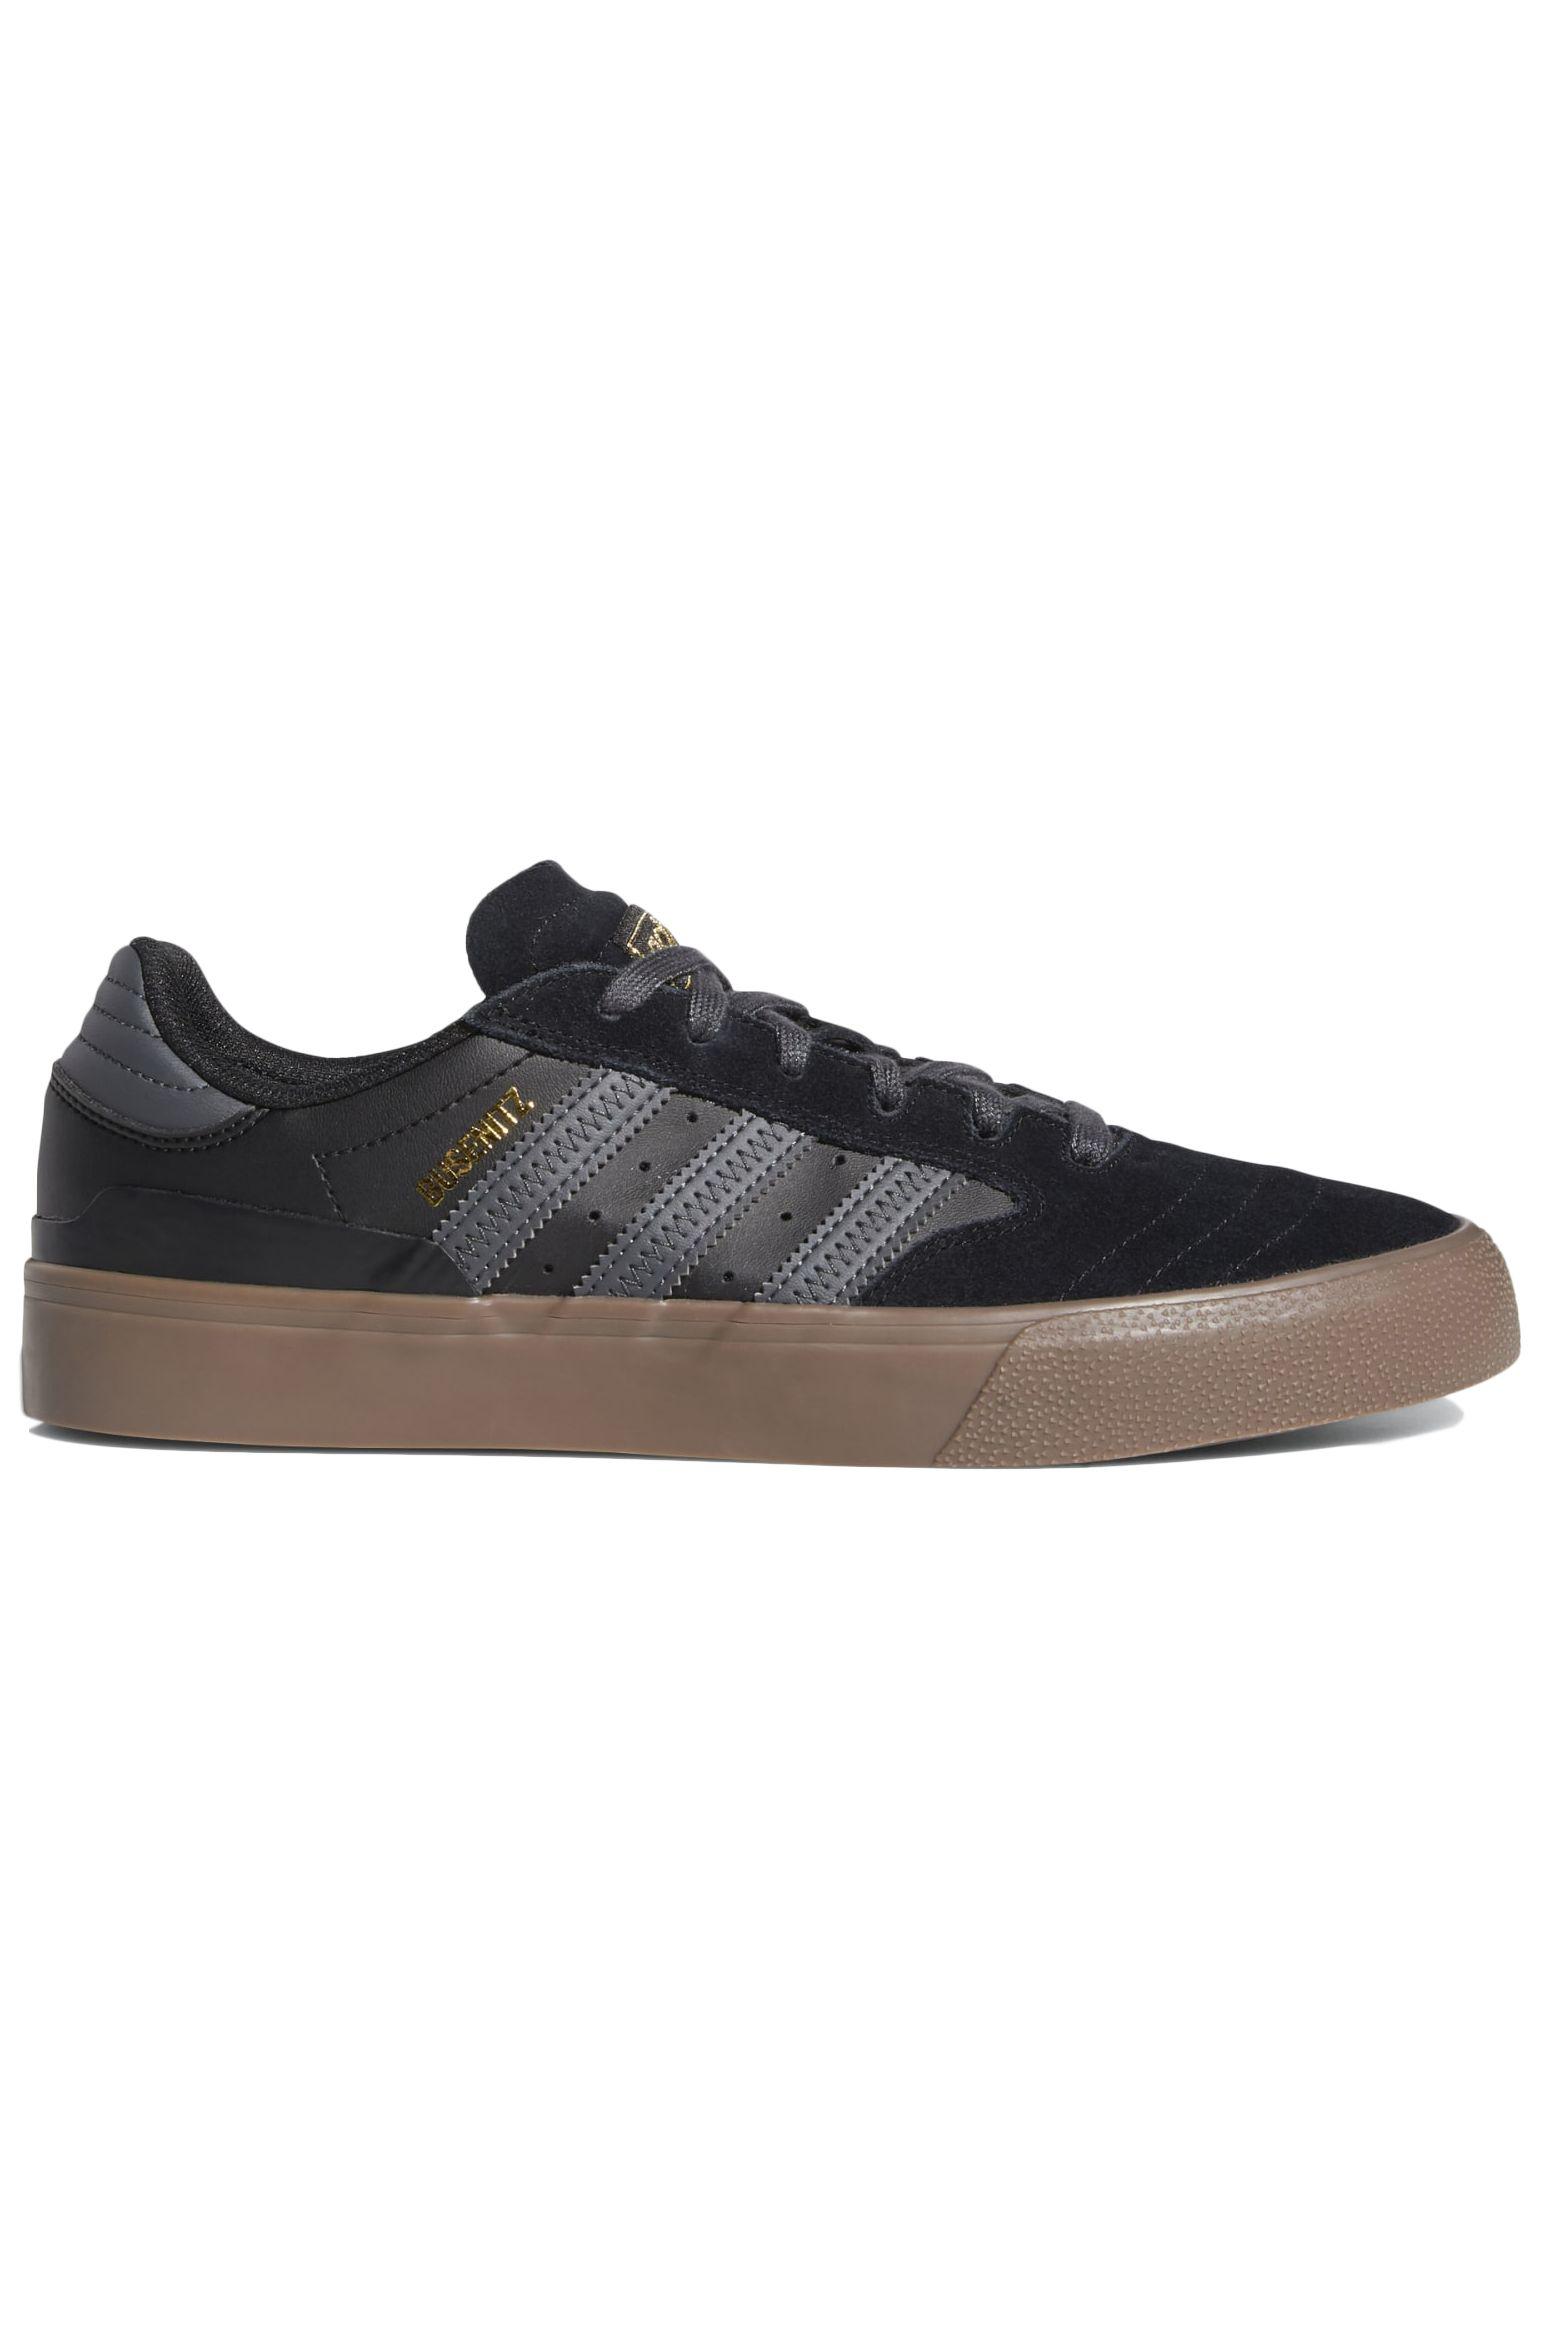 Adidas Shoes BUSENITZ VULC II Core Black/Grey Six/Gum5